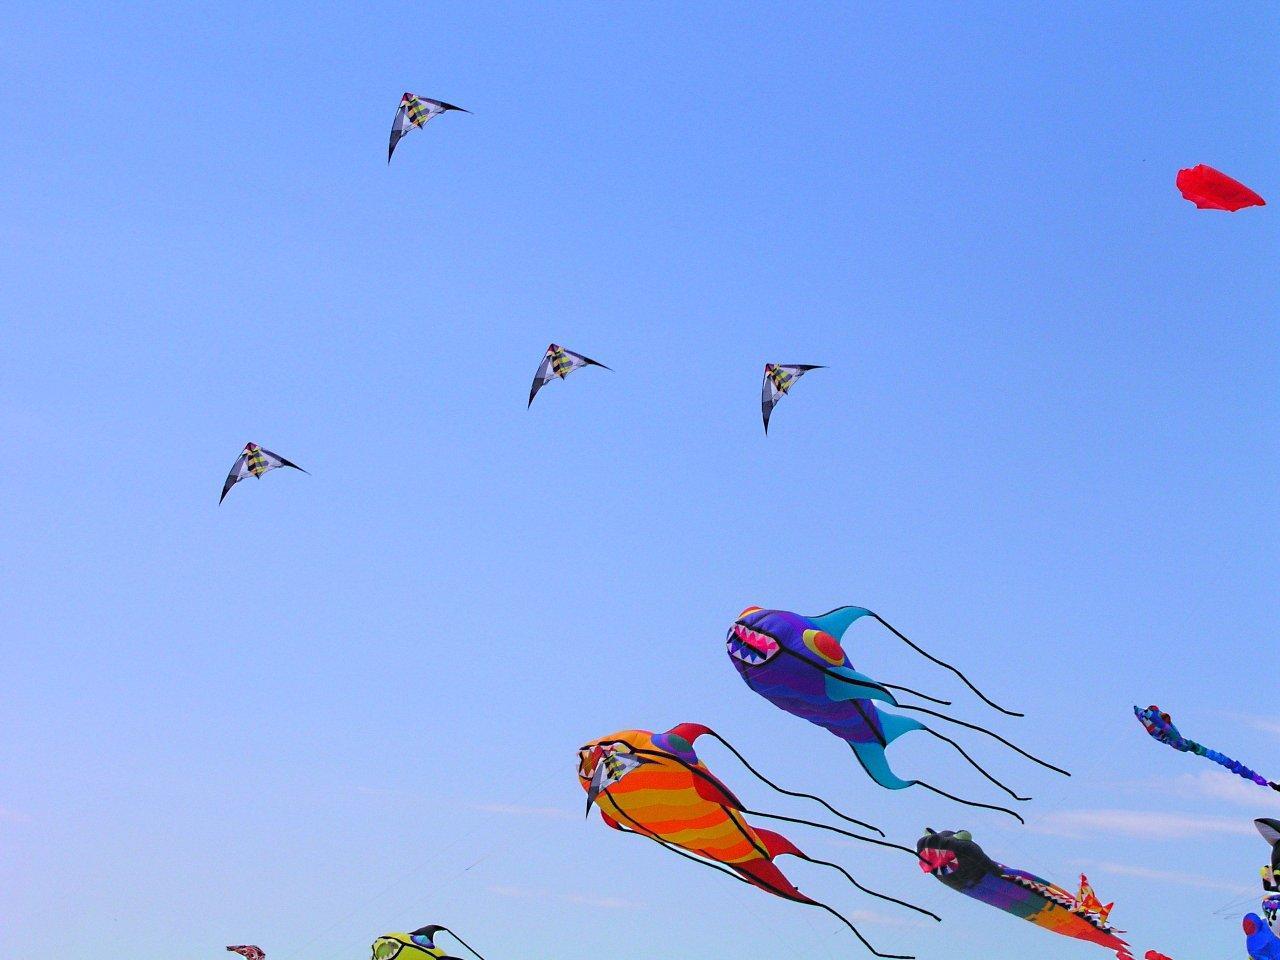 Grand Haven Michigan Kite Festival (2) by Thomas Peace 2013